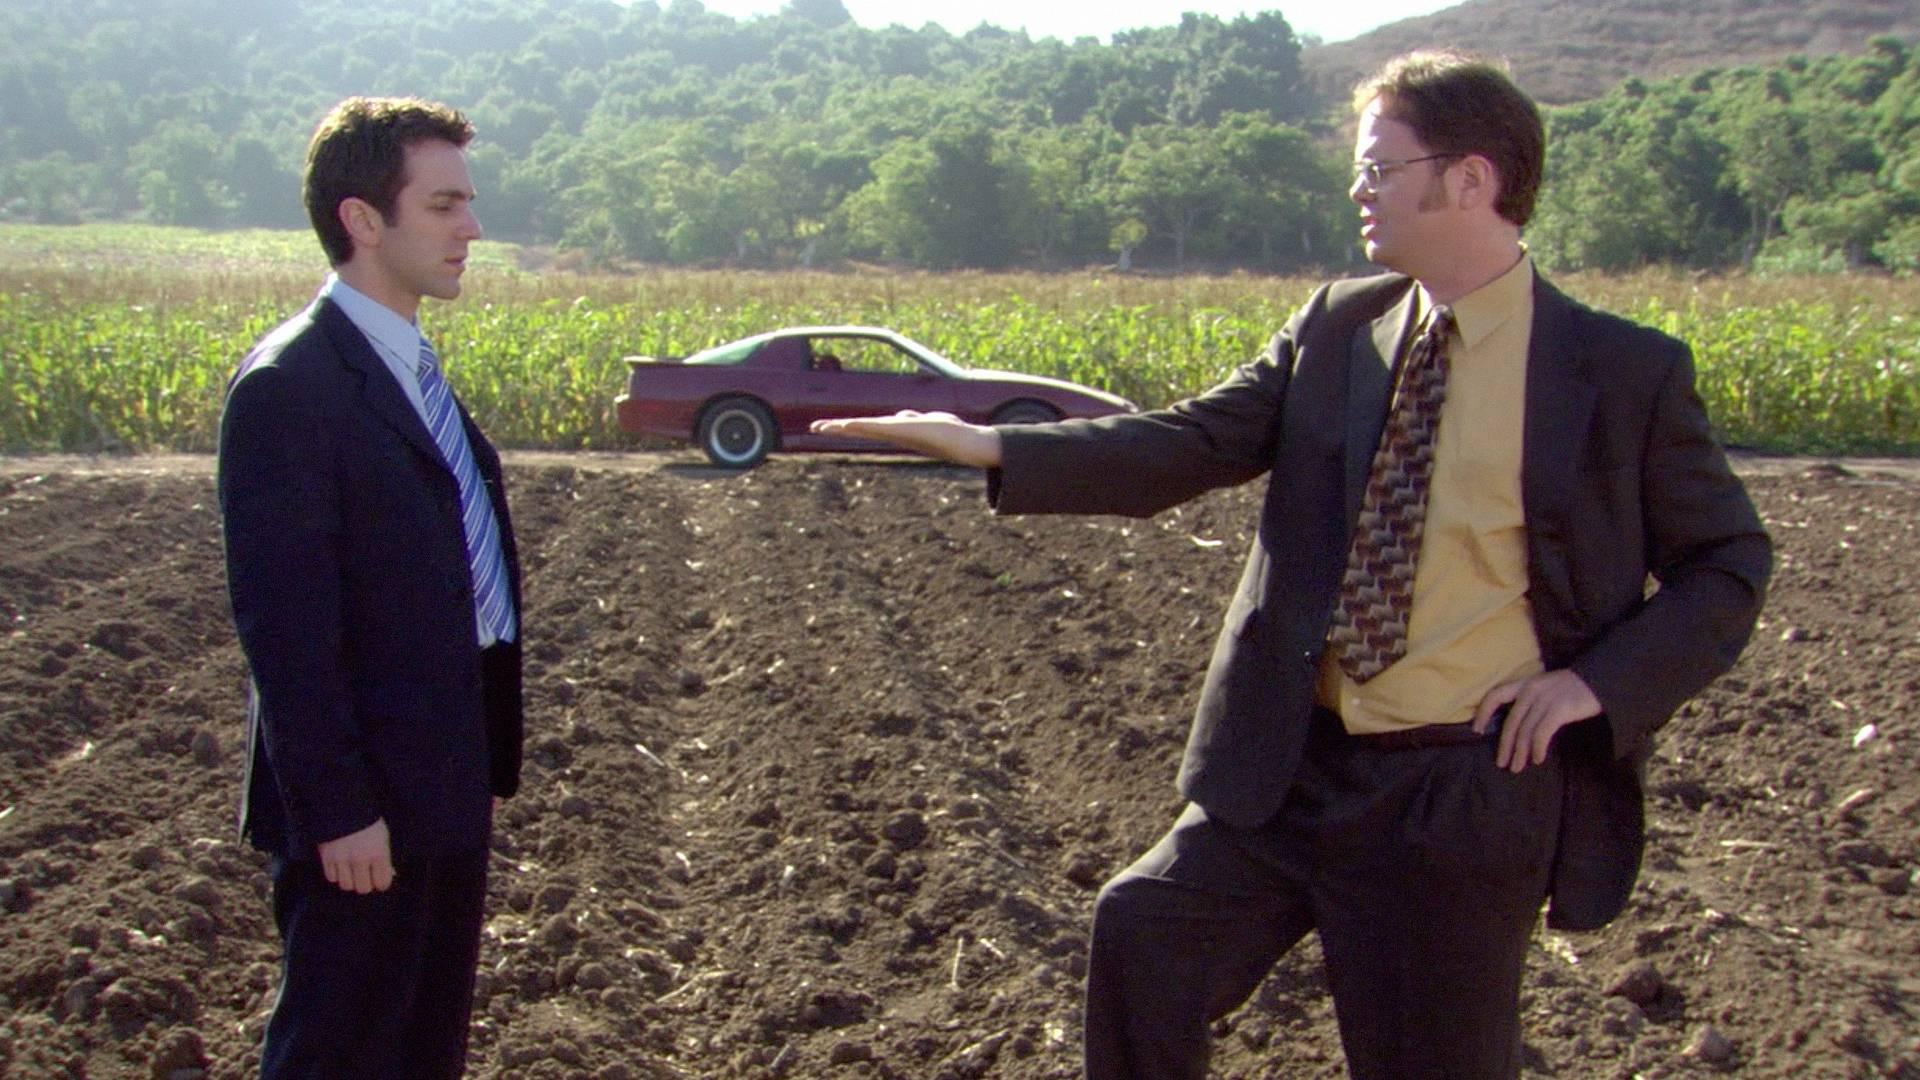 The Office Season 3 Episode 5